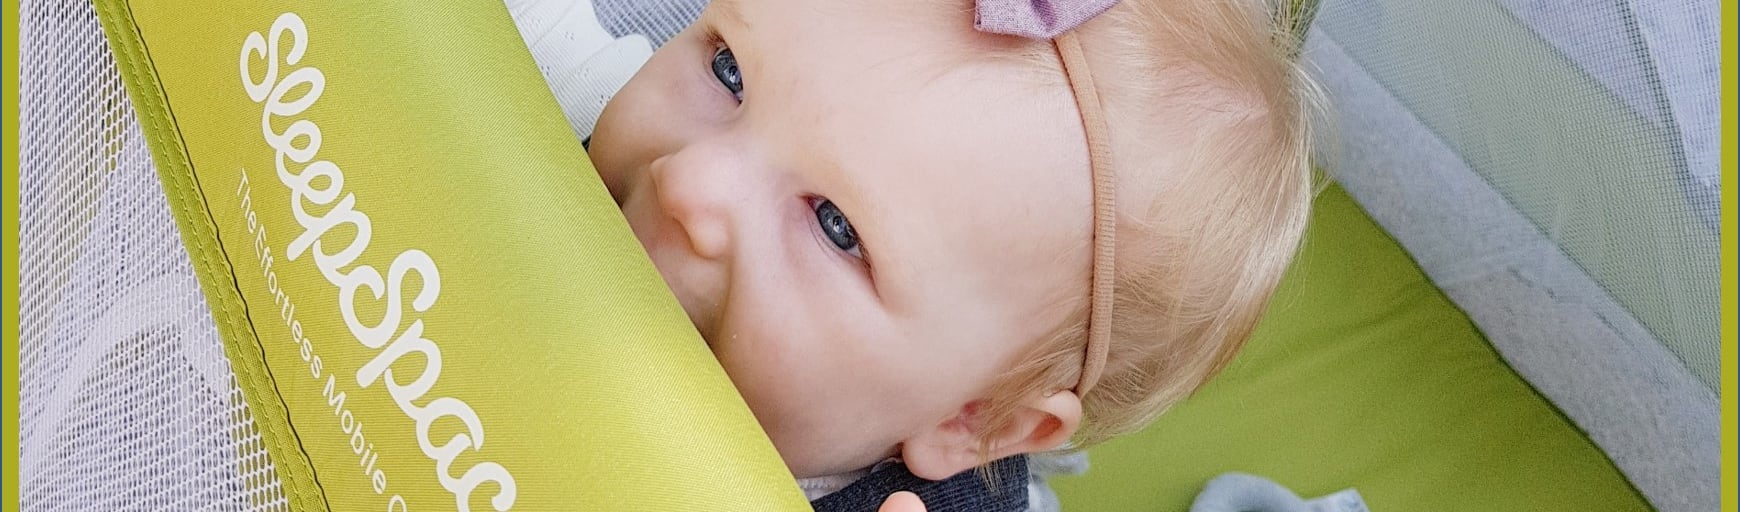 Babyhub Ltd